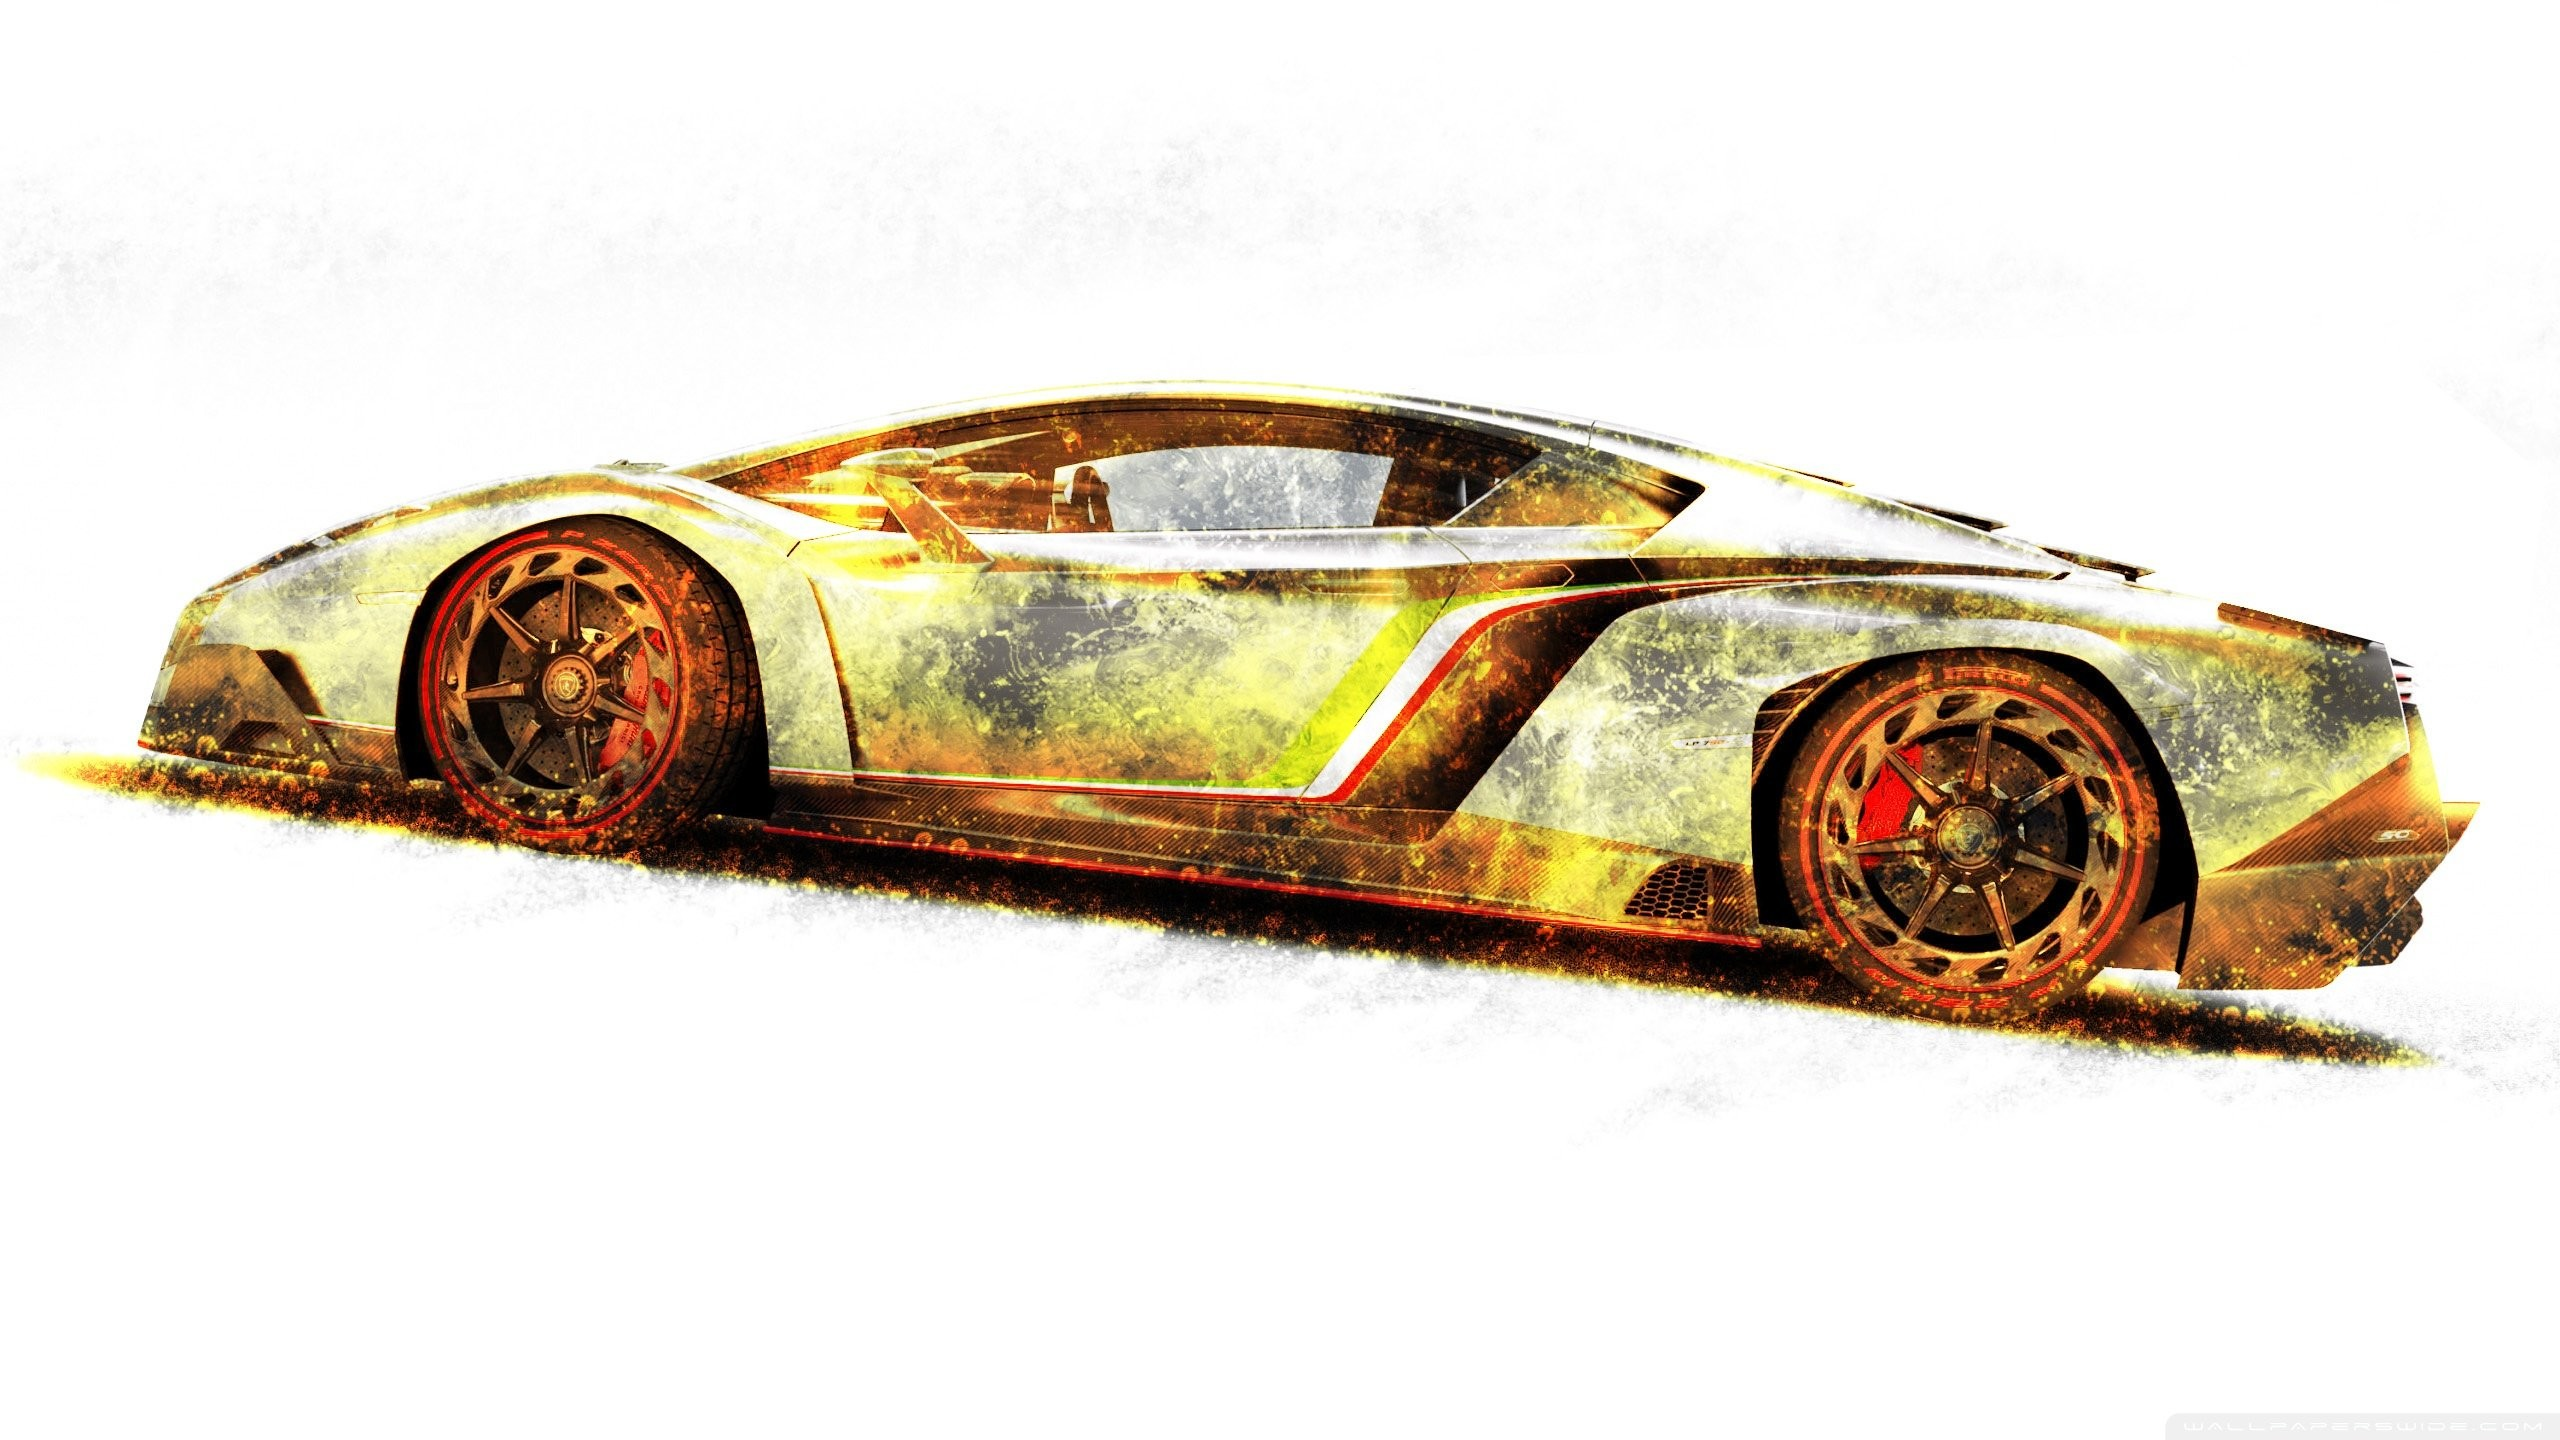 Res: 2560x1440, Lamborghini veneno gold edition-wallpaper- wallpaper       238459   WallpaperUP